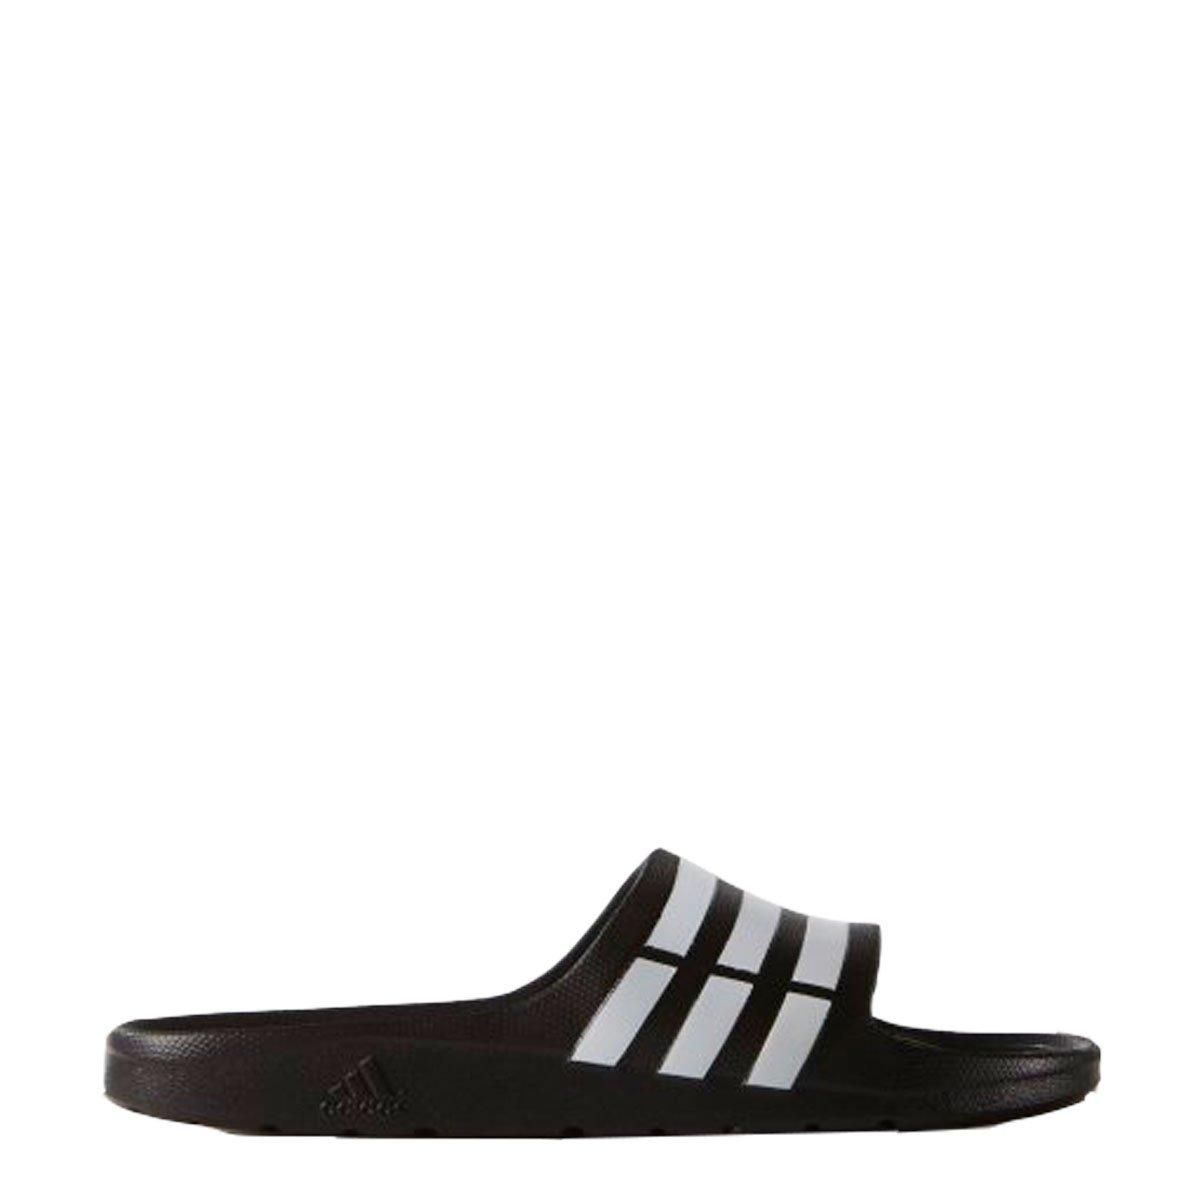 07f594f6dc Bizz Store - Chinelo Slide Adidas Duramo Unissex